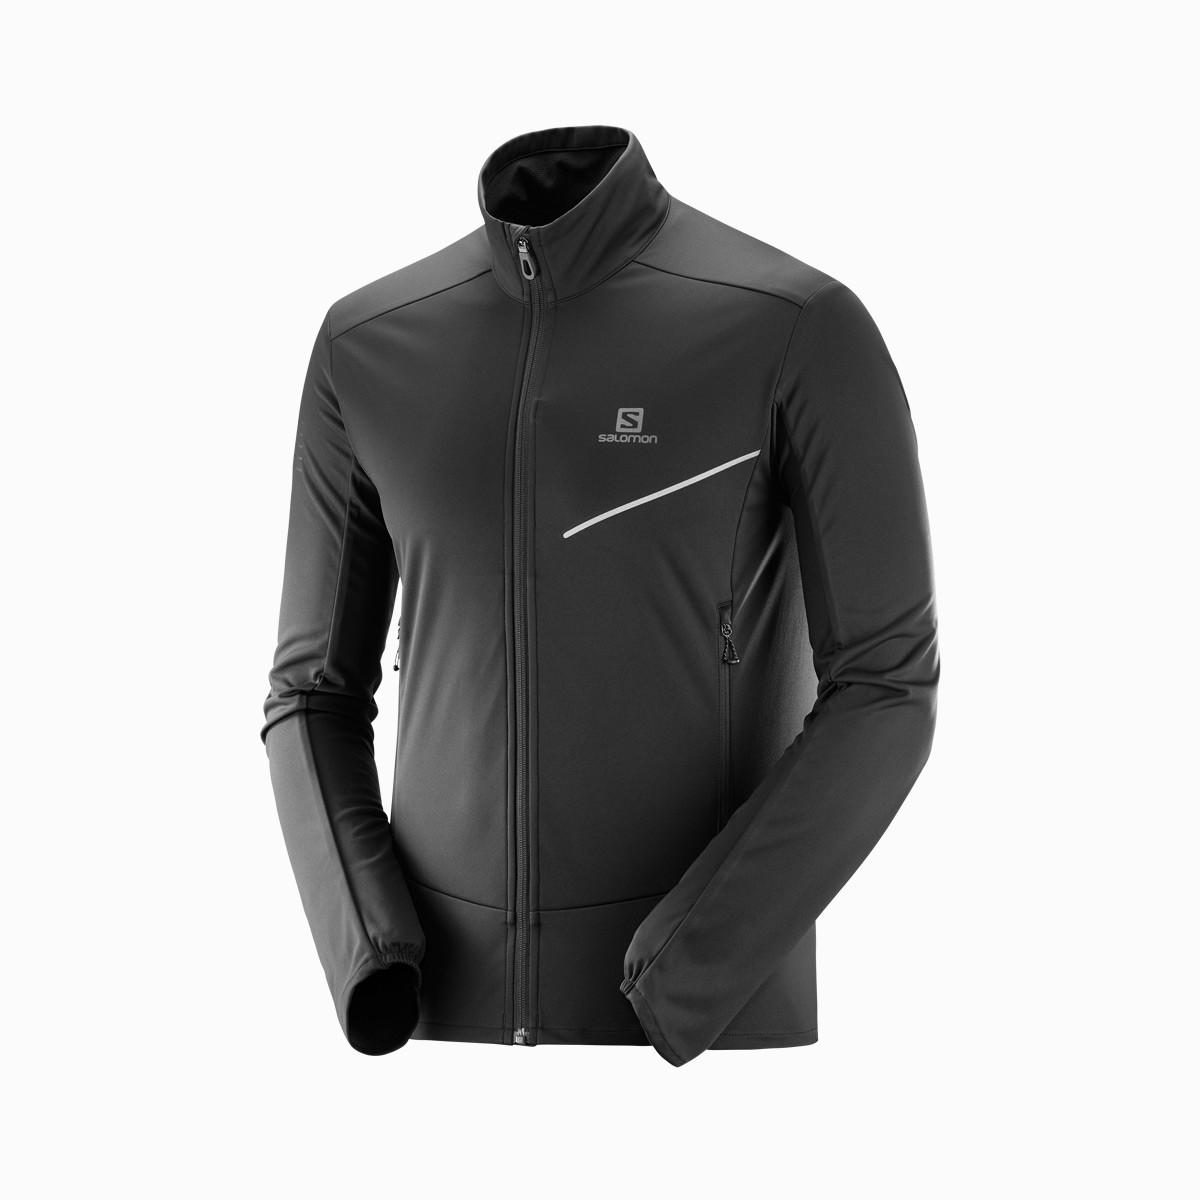 萨洛蒙保暖舒适 时尚男款软壳茄克 RS SOFTSHELL 黑色LC1161100